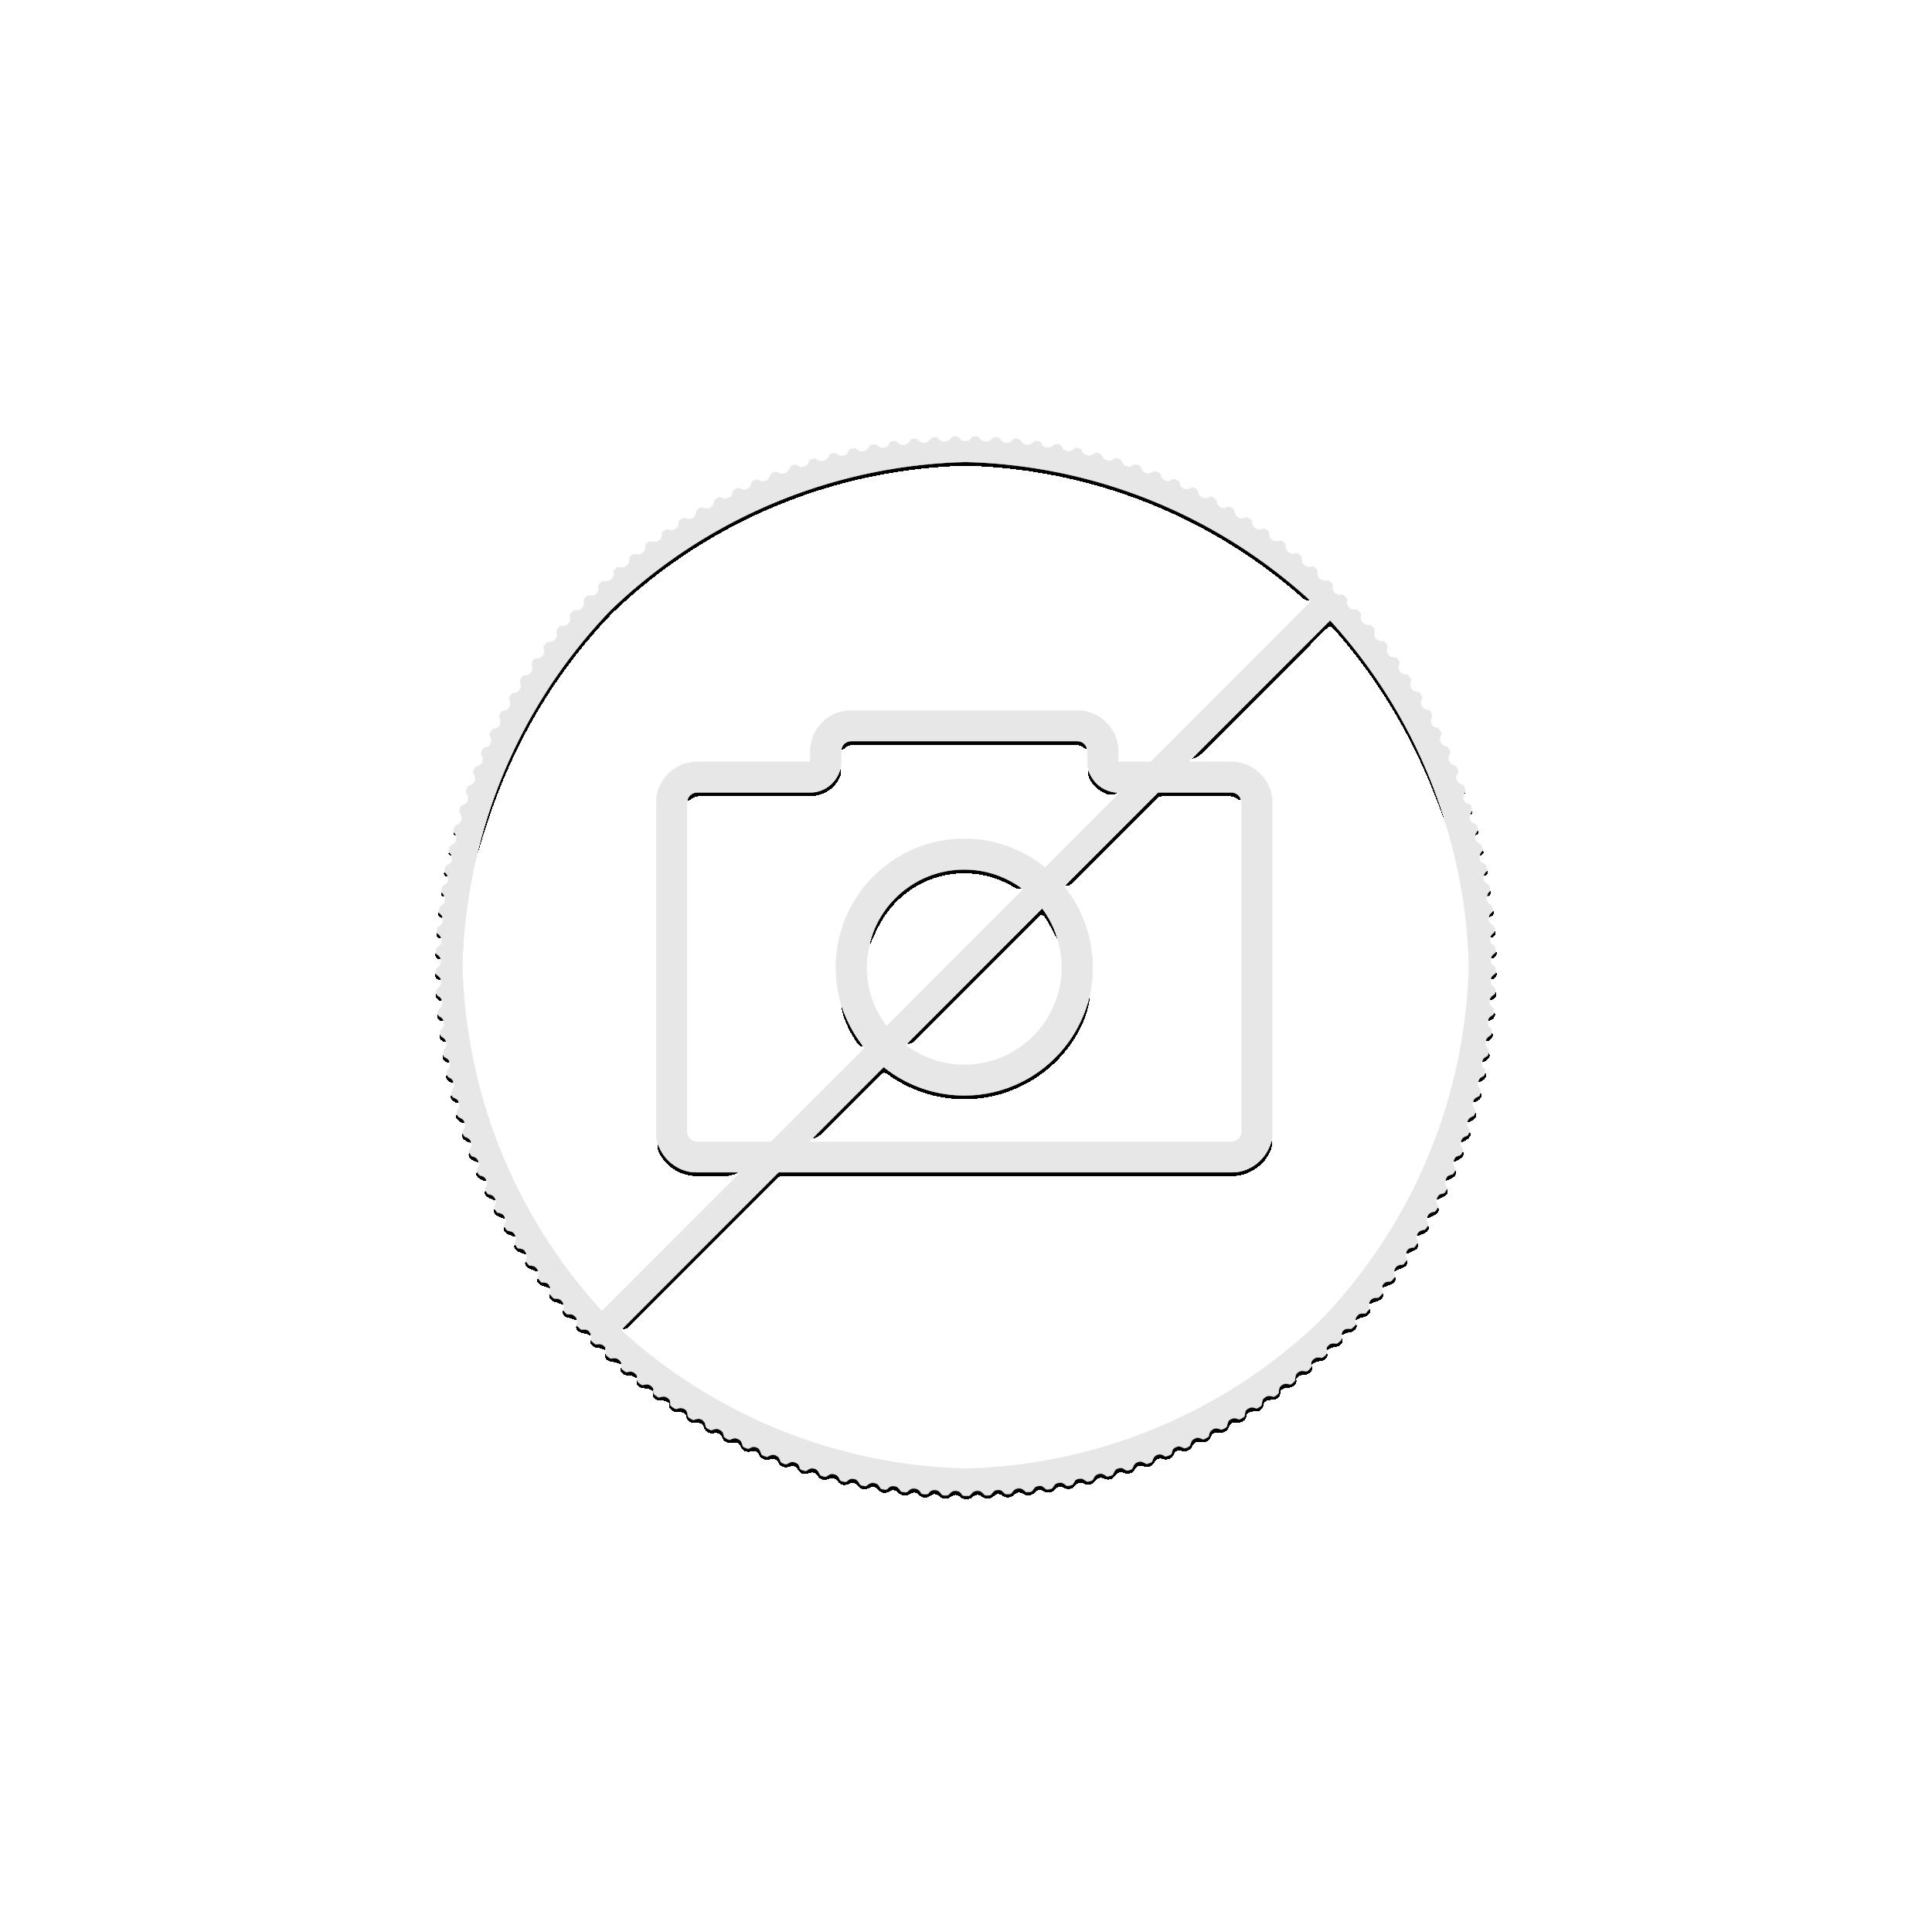 1/20 Troy ounce silver coin Mexican Libertad 2019